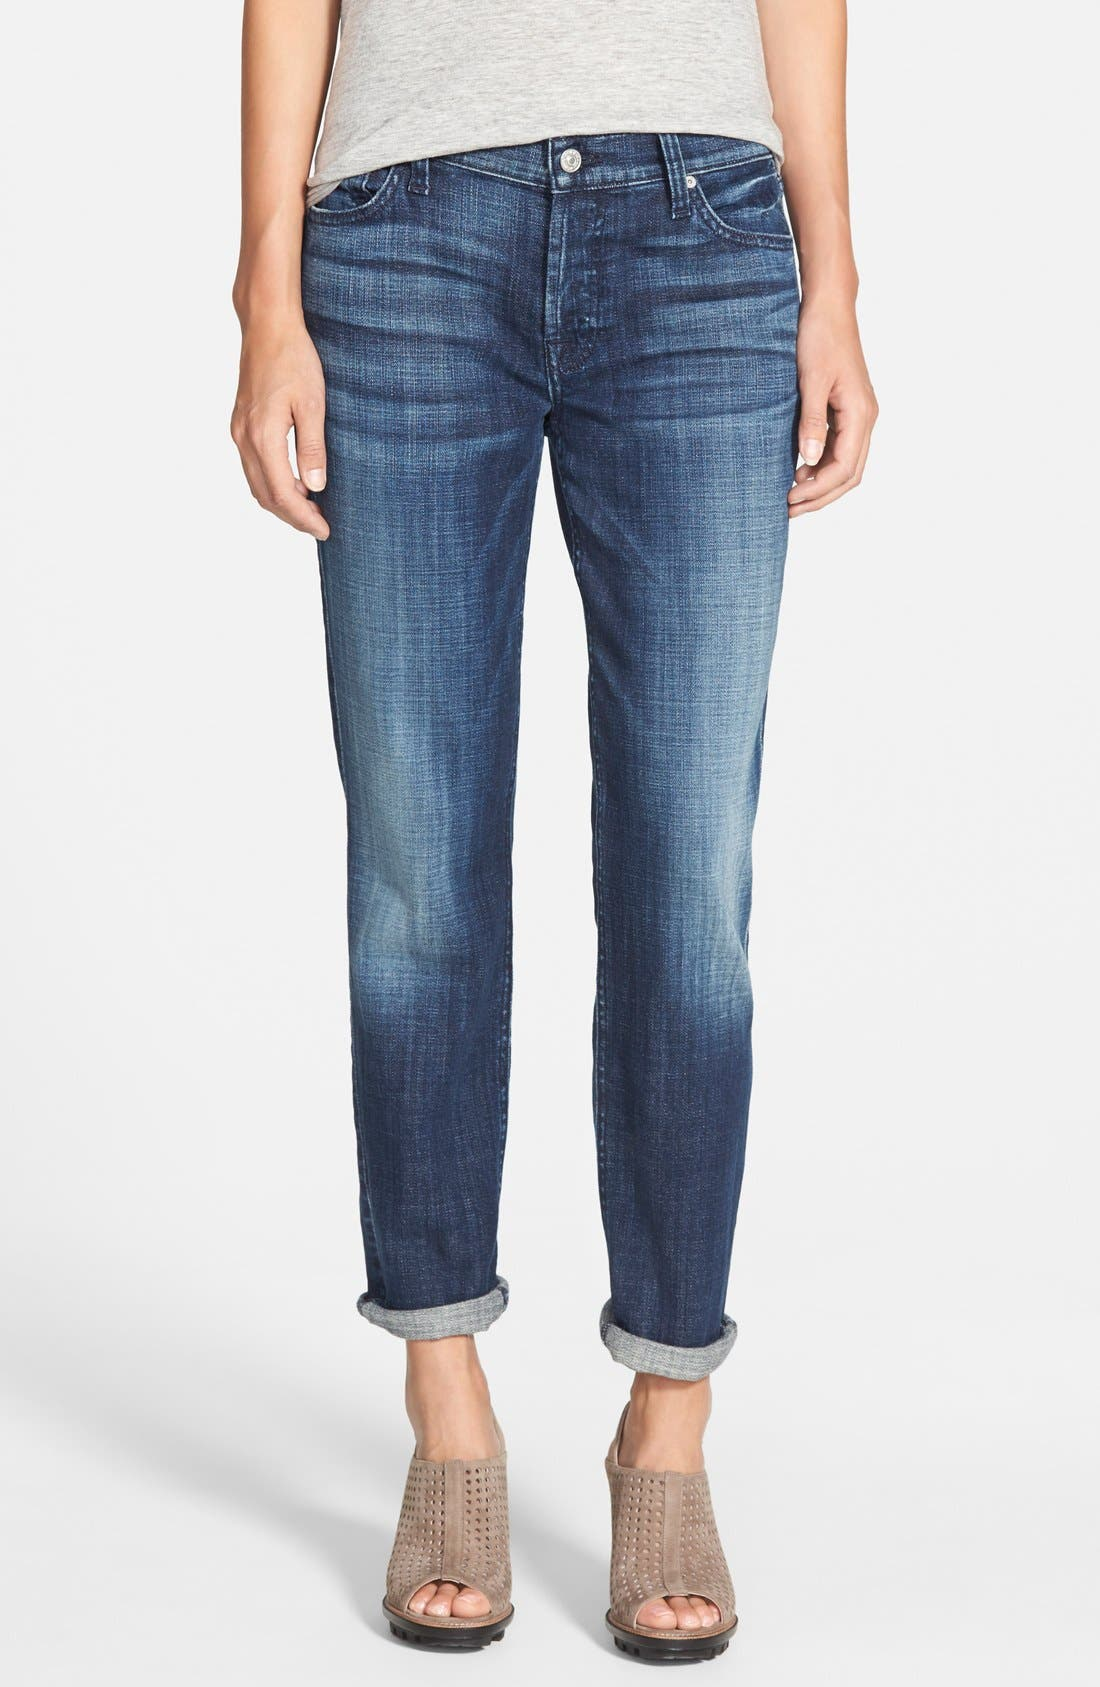 Alternate Image 1 Selected - 7 For All Mankind® 'Josefina' Boyfriend Jeans (Royal Broken Twill)